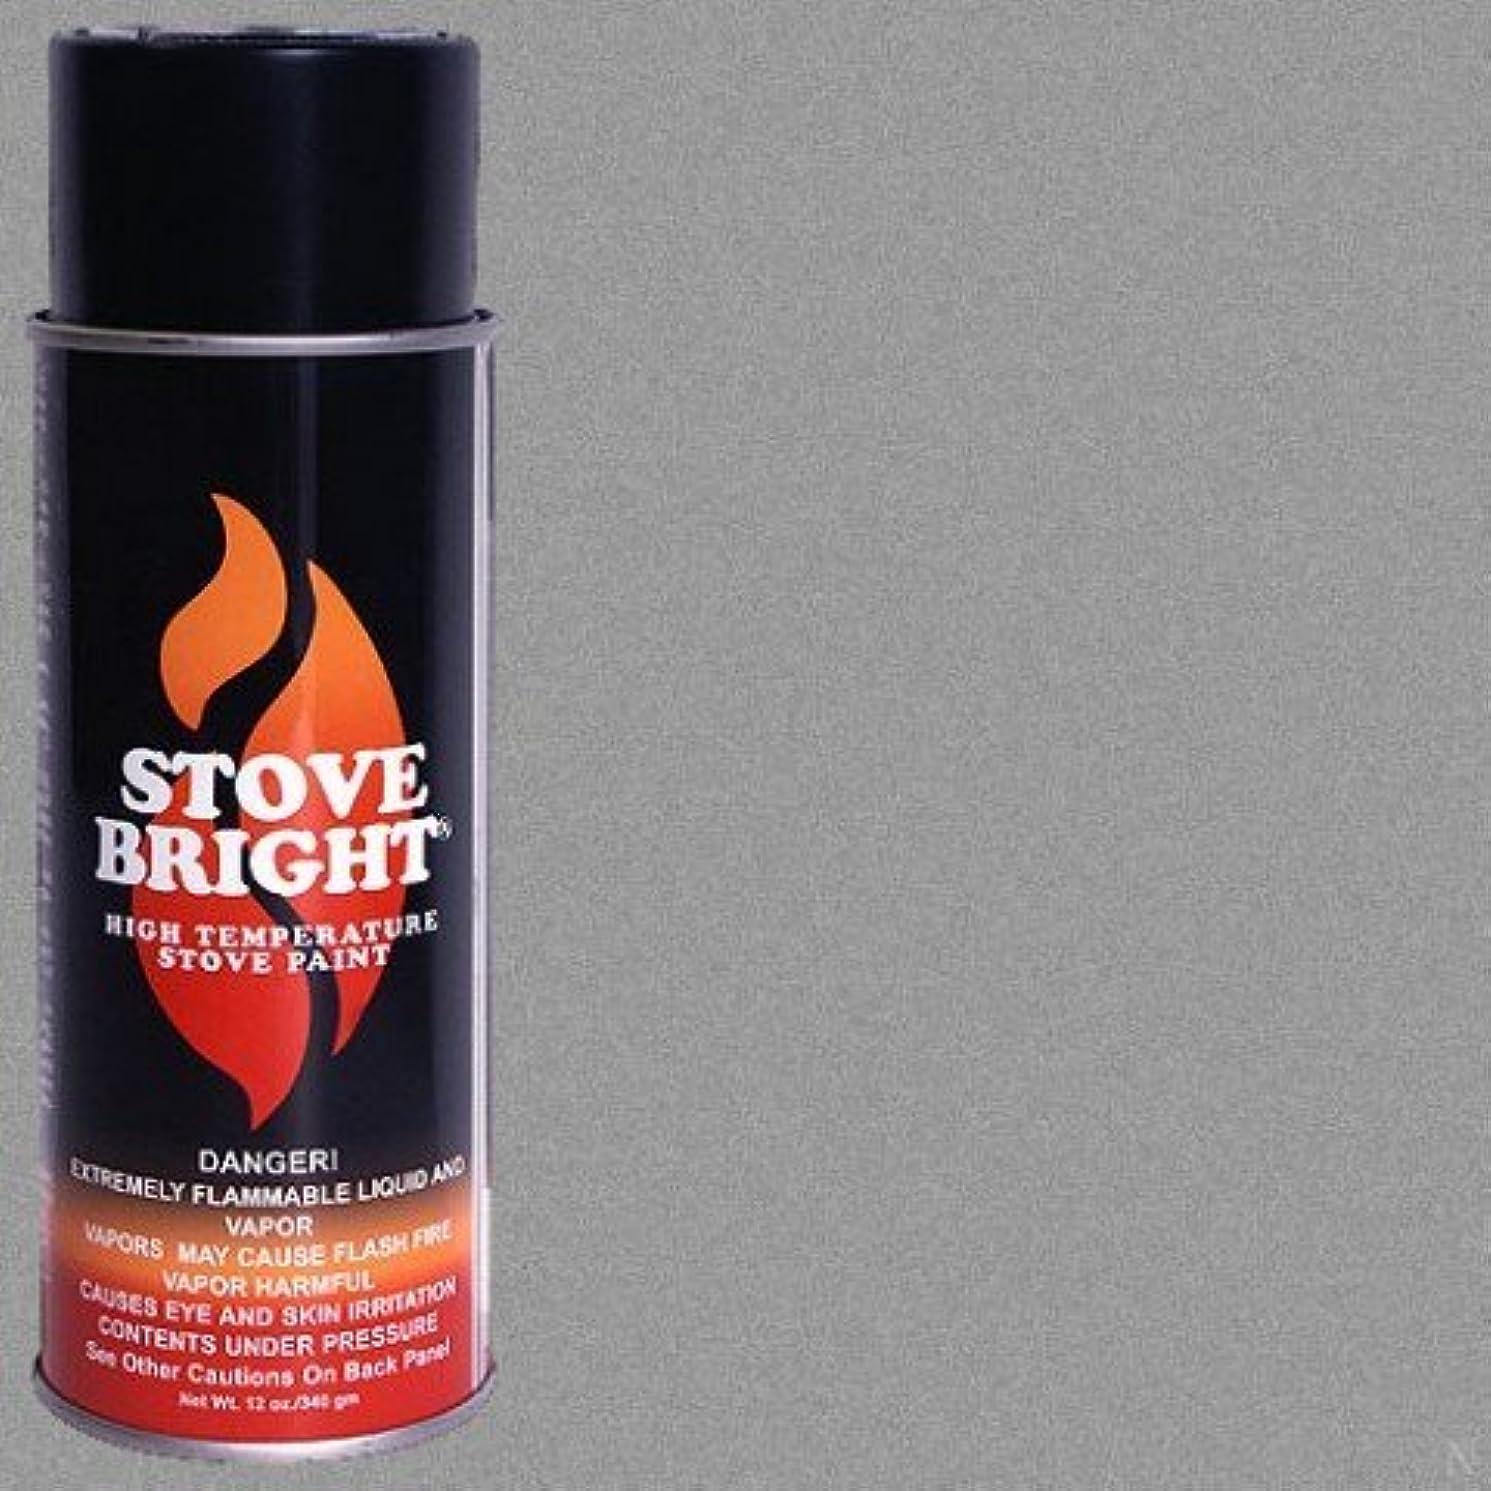 Stove Bright TI-8118 High Temperature Paint, 1200 Degree F Operating Temperature Range, 12 oz Aerosol, Metallic Gray